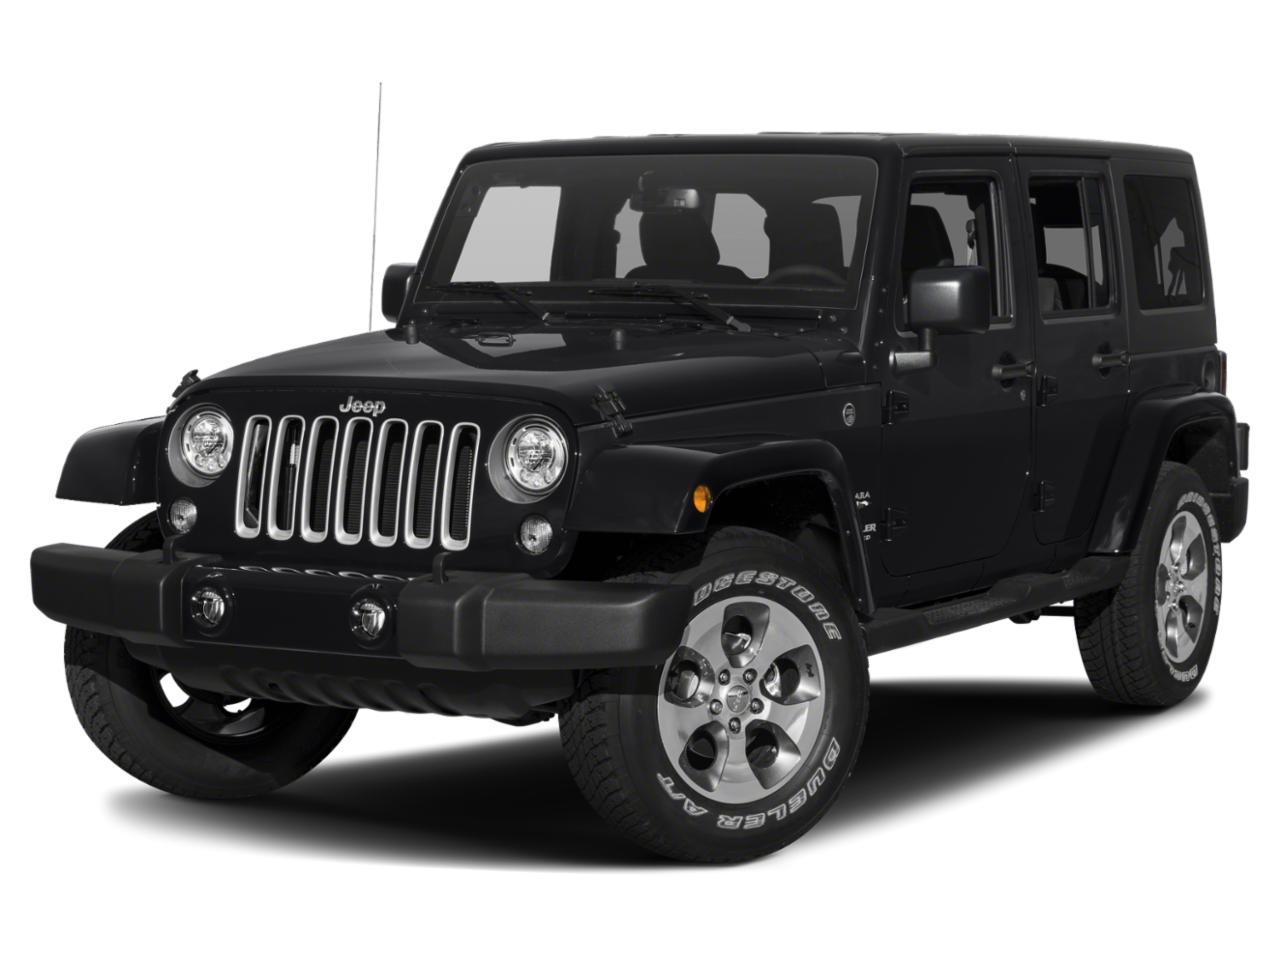 2018 Jeep Wrangler JK Unlimited Vehicle Photo in CHAMPLAIN, NY 12919-0000